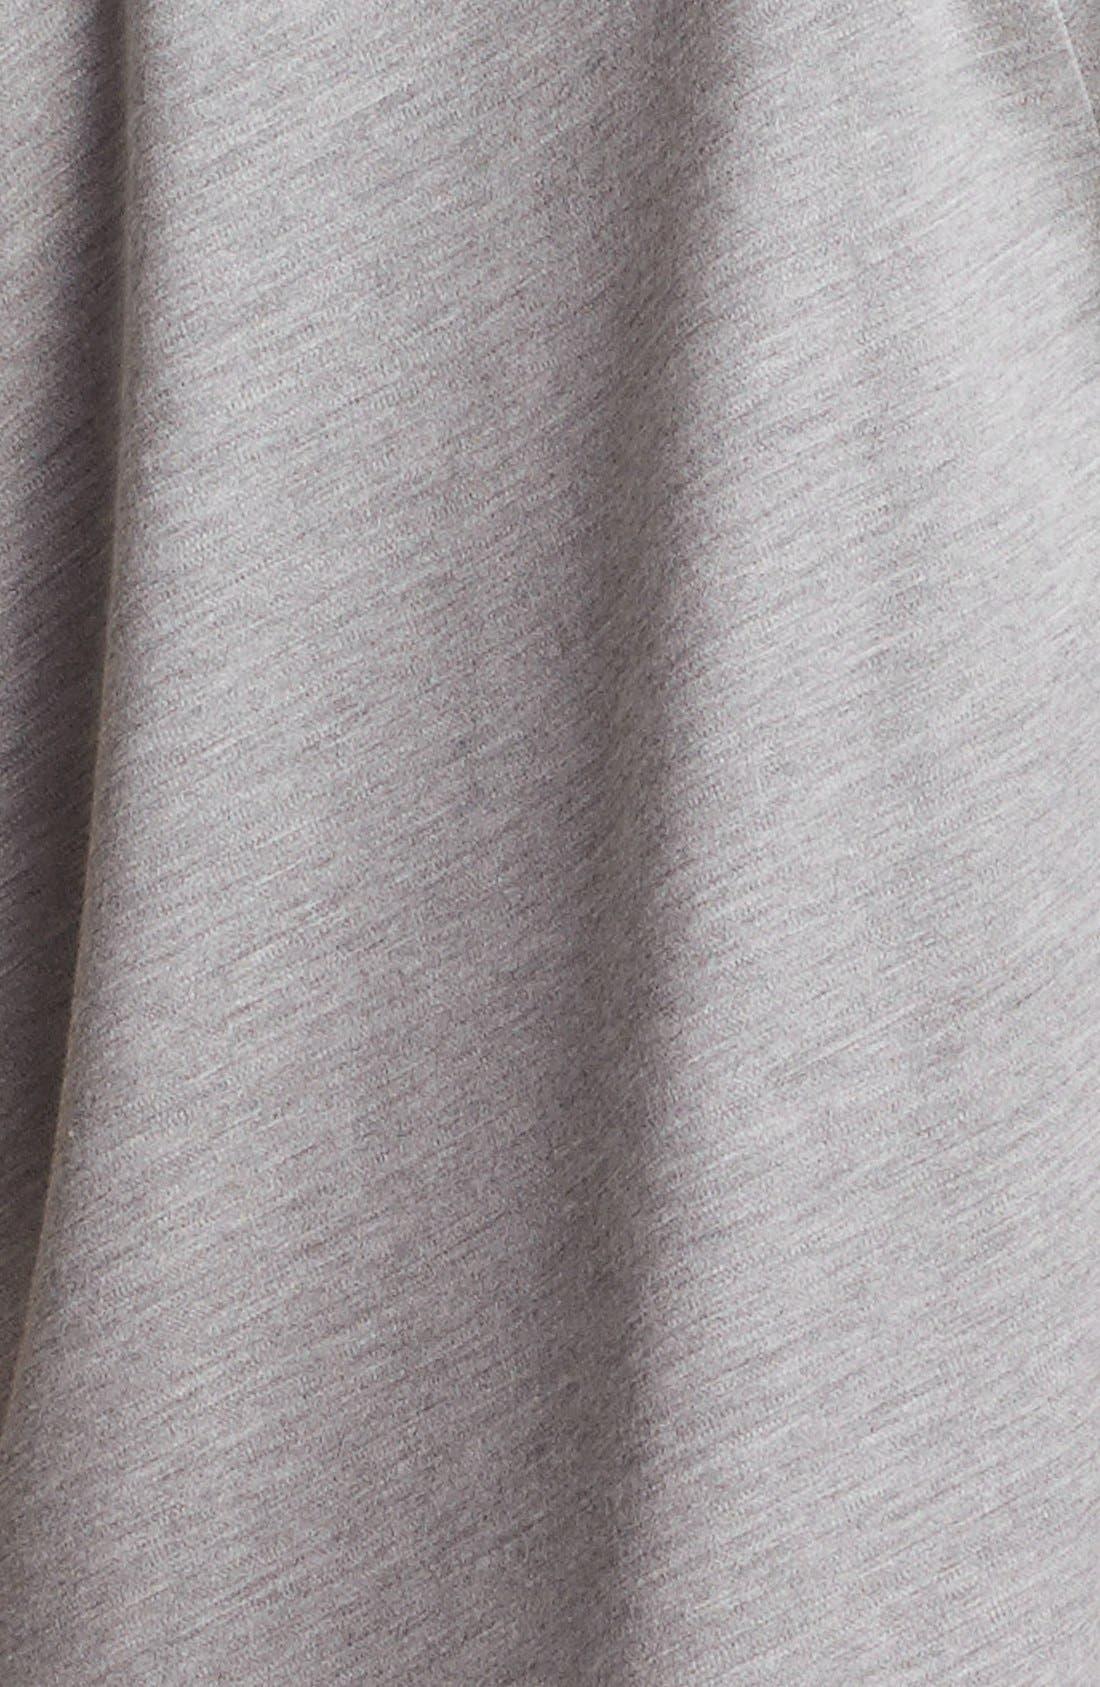 Alternate Image 4  - Alexander Wang Asymmetrical Mélange Jersey Tee